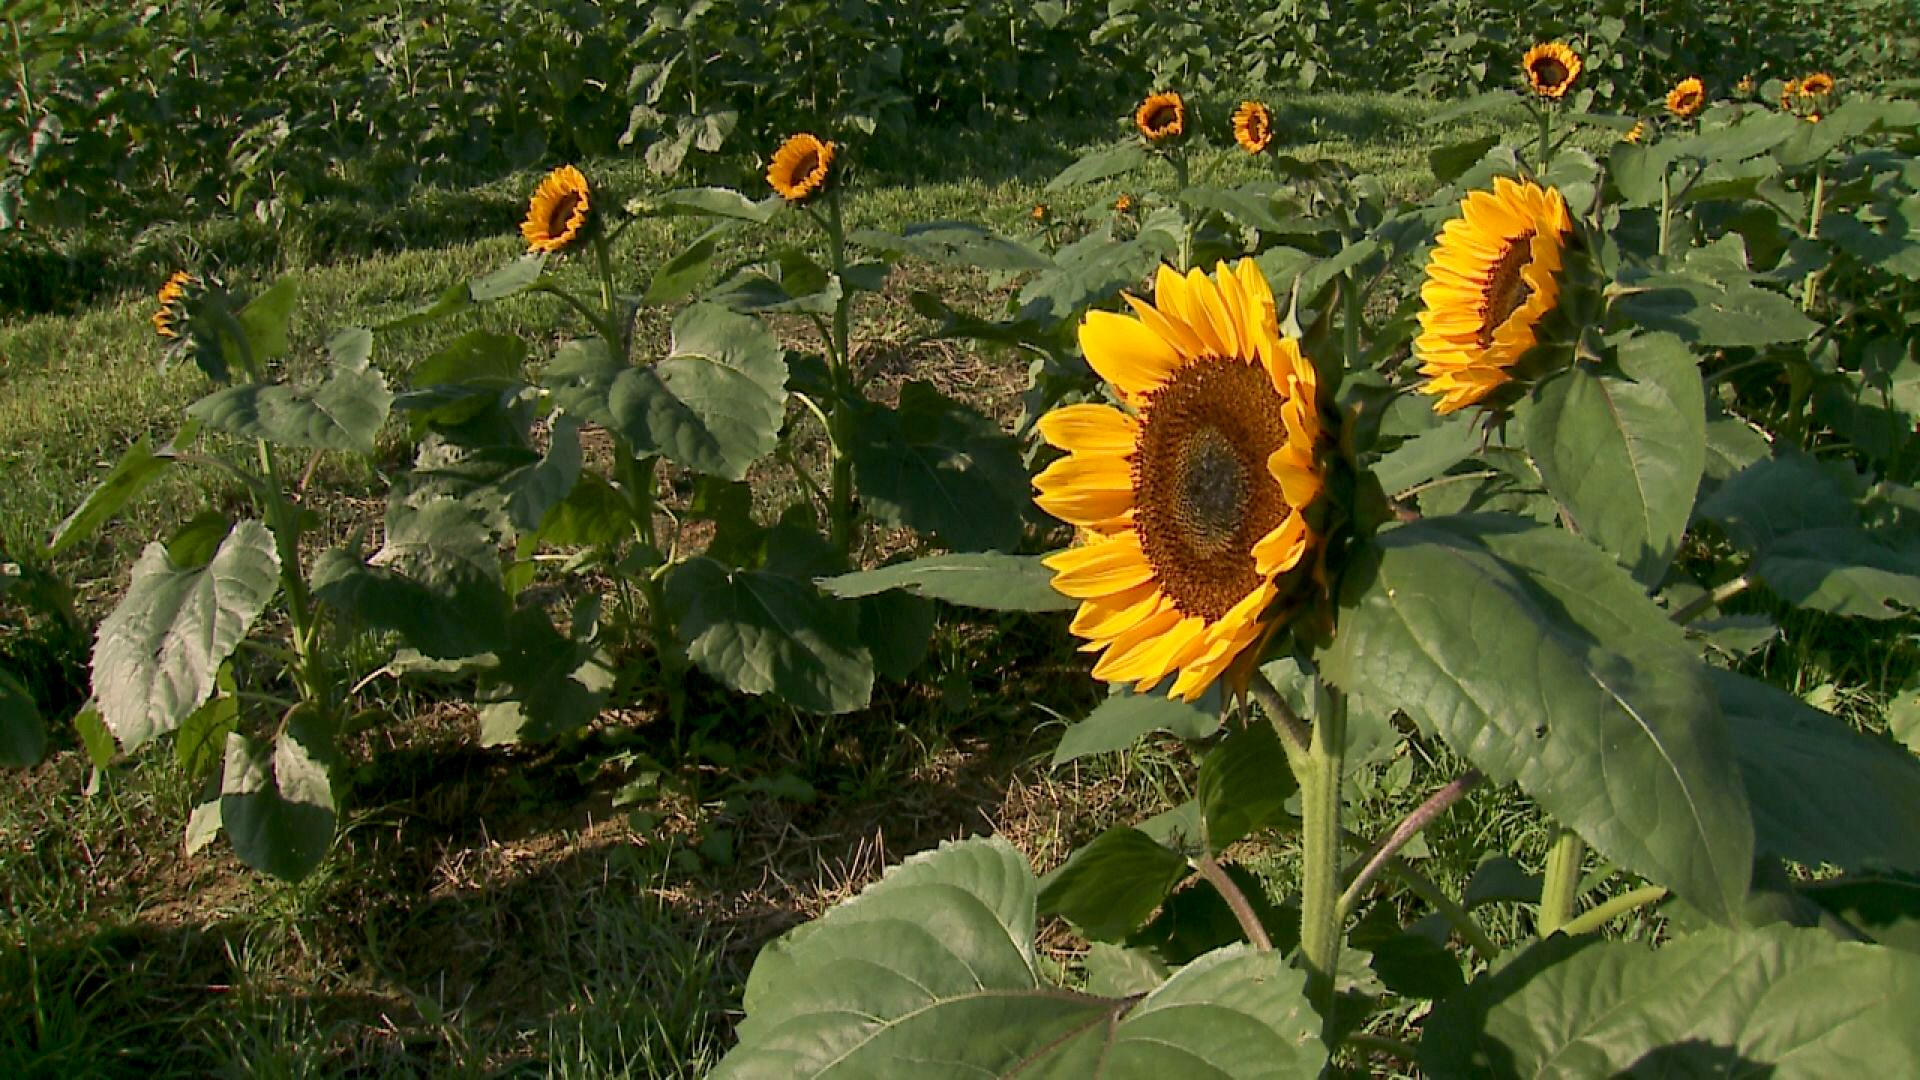 Sunflower Filed Opens At Cornucopia Farm Whas11 Com